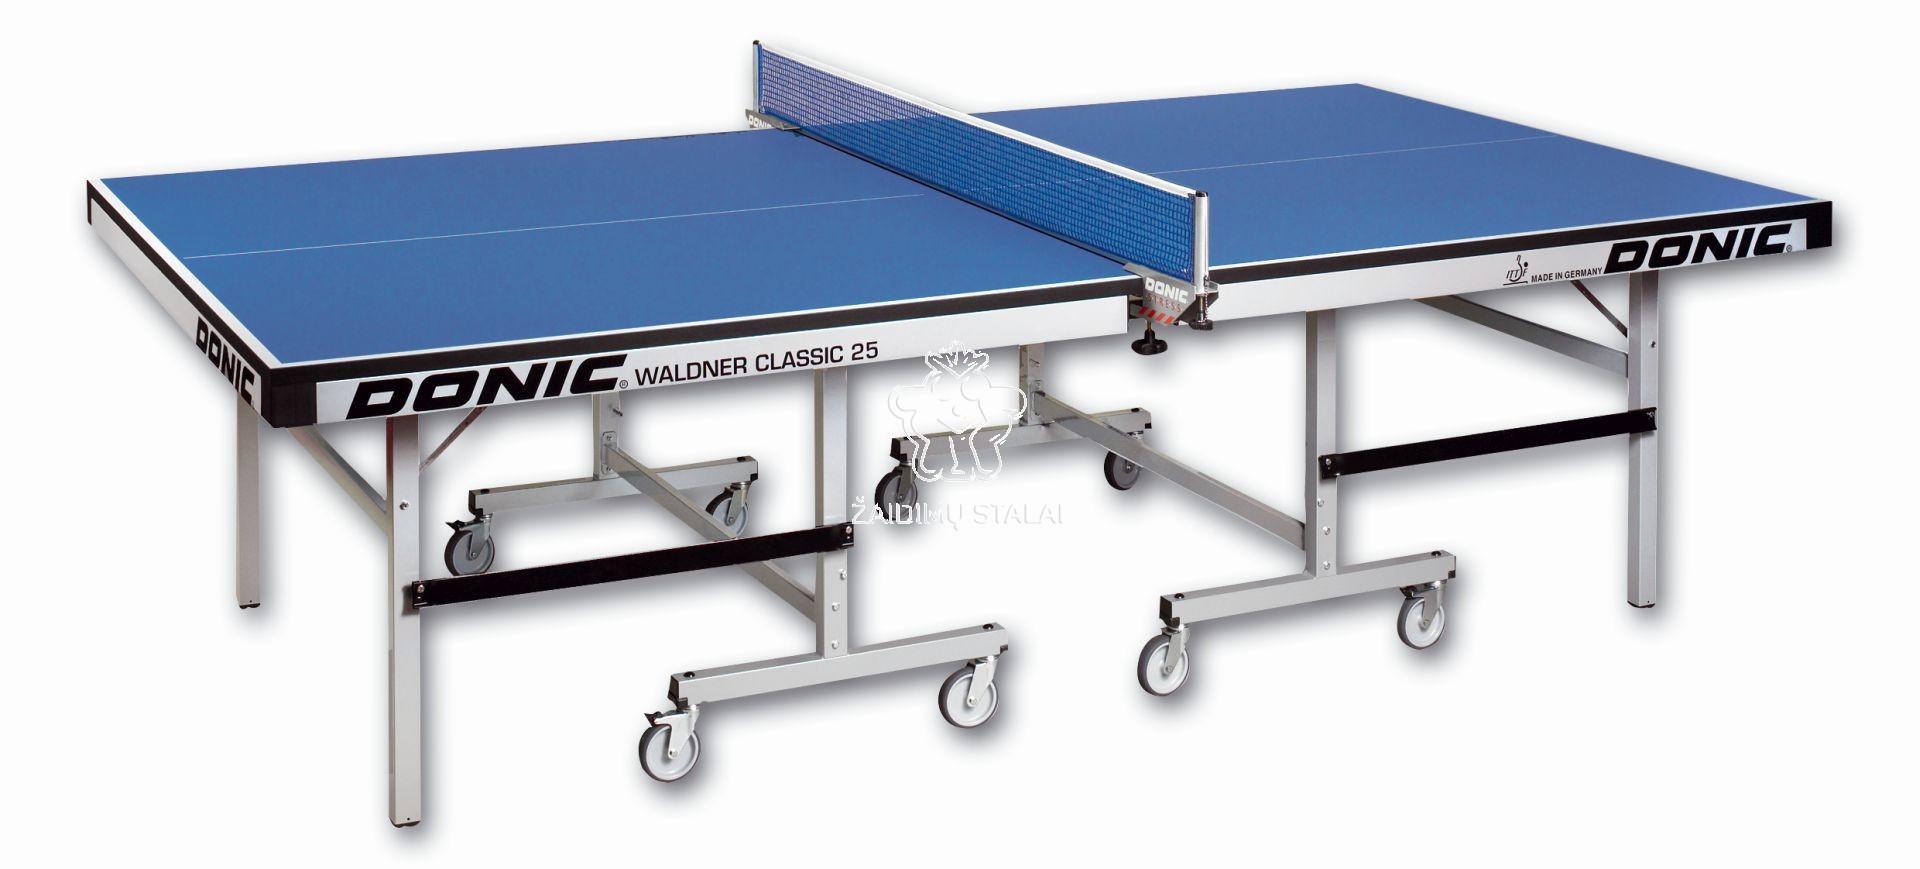 Stalo teniso stalas Donic Waldner Classic, mėlynas, 25mm MDF, ITTF